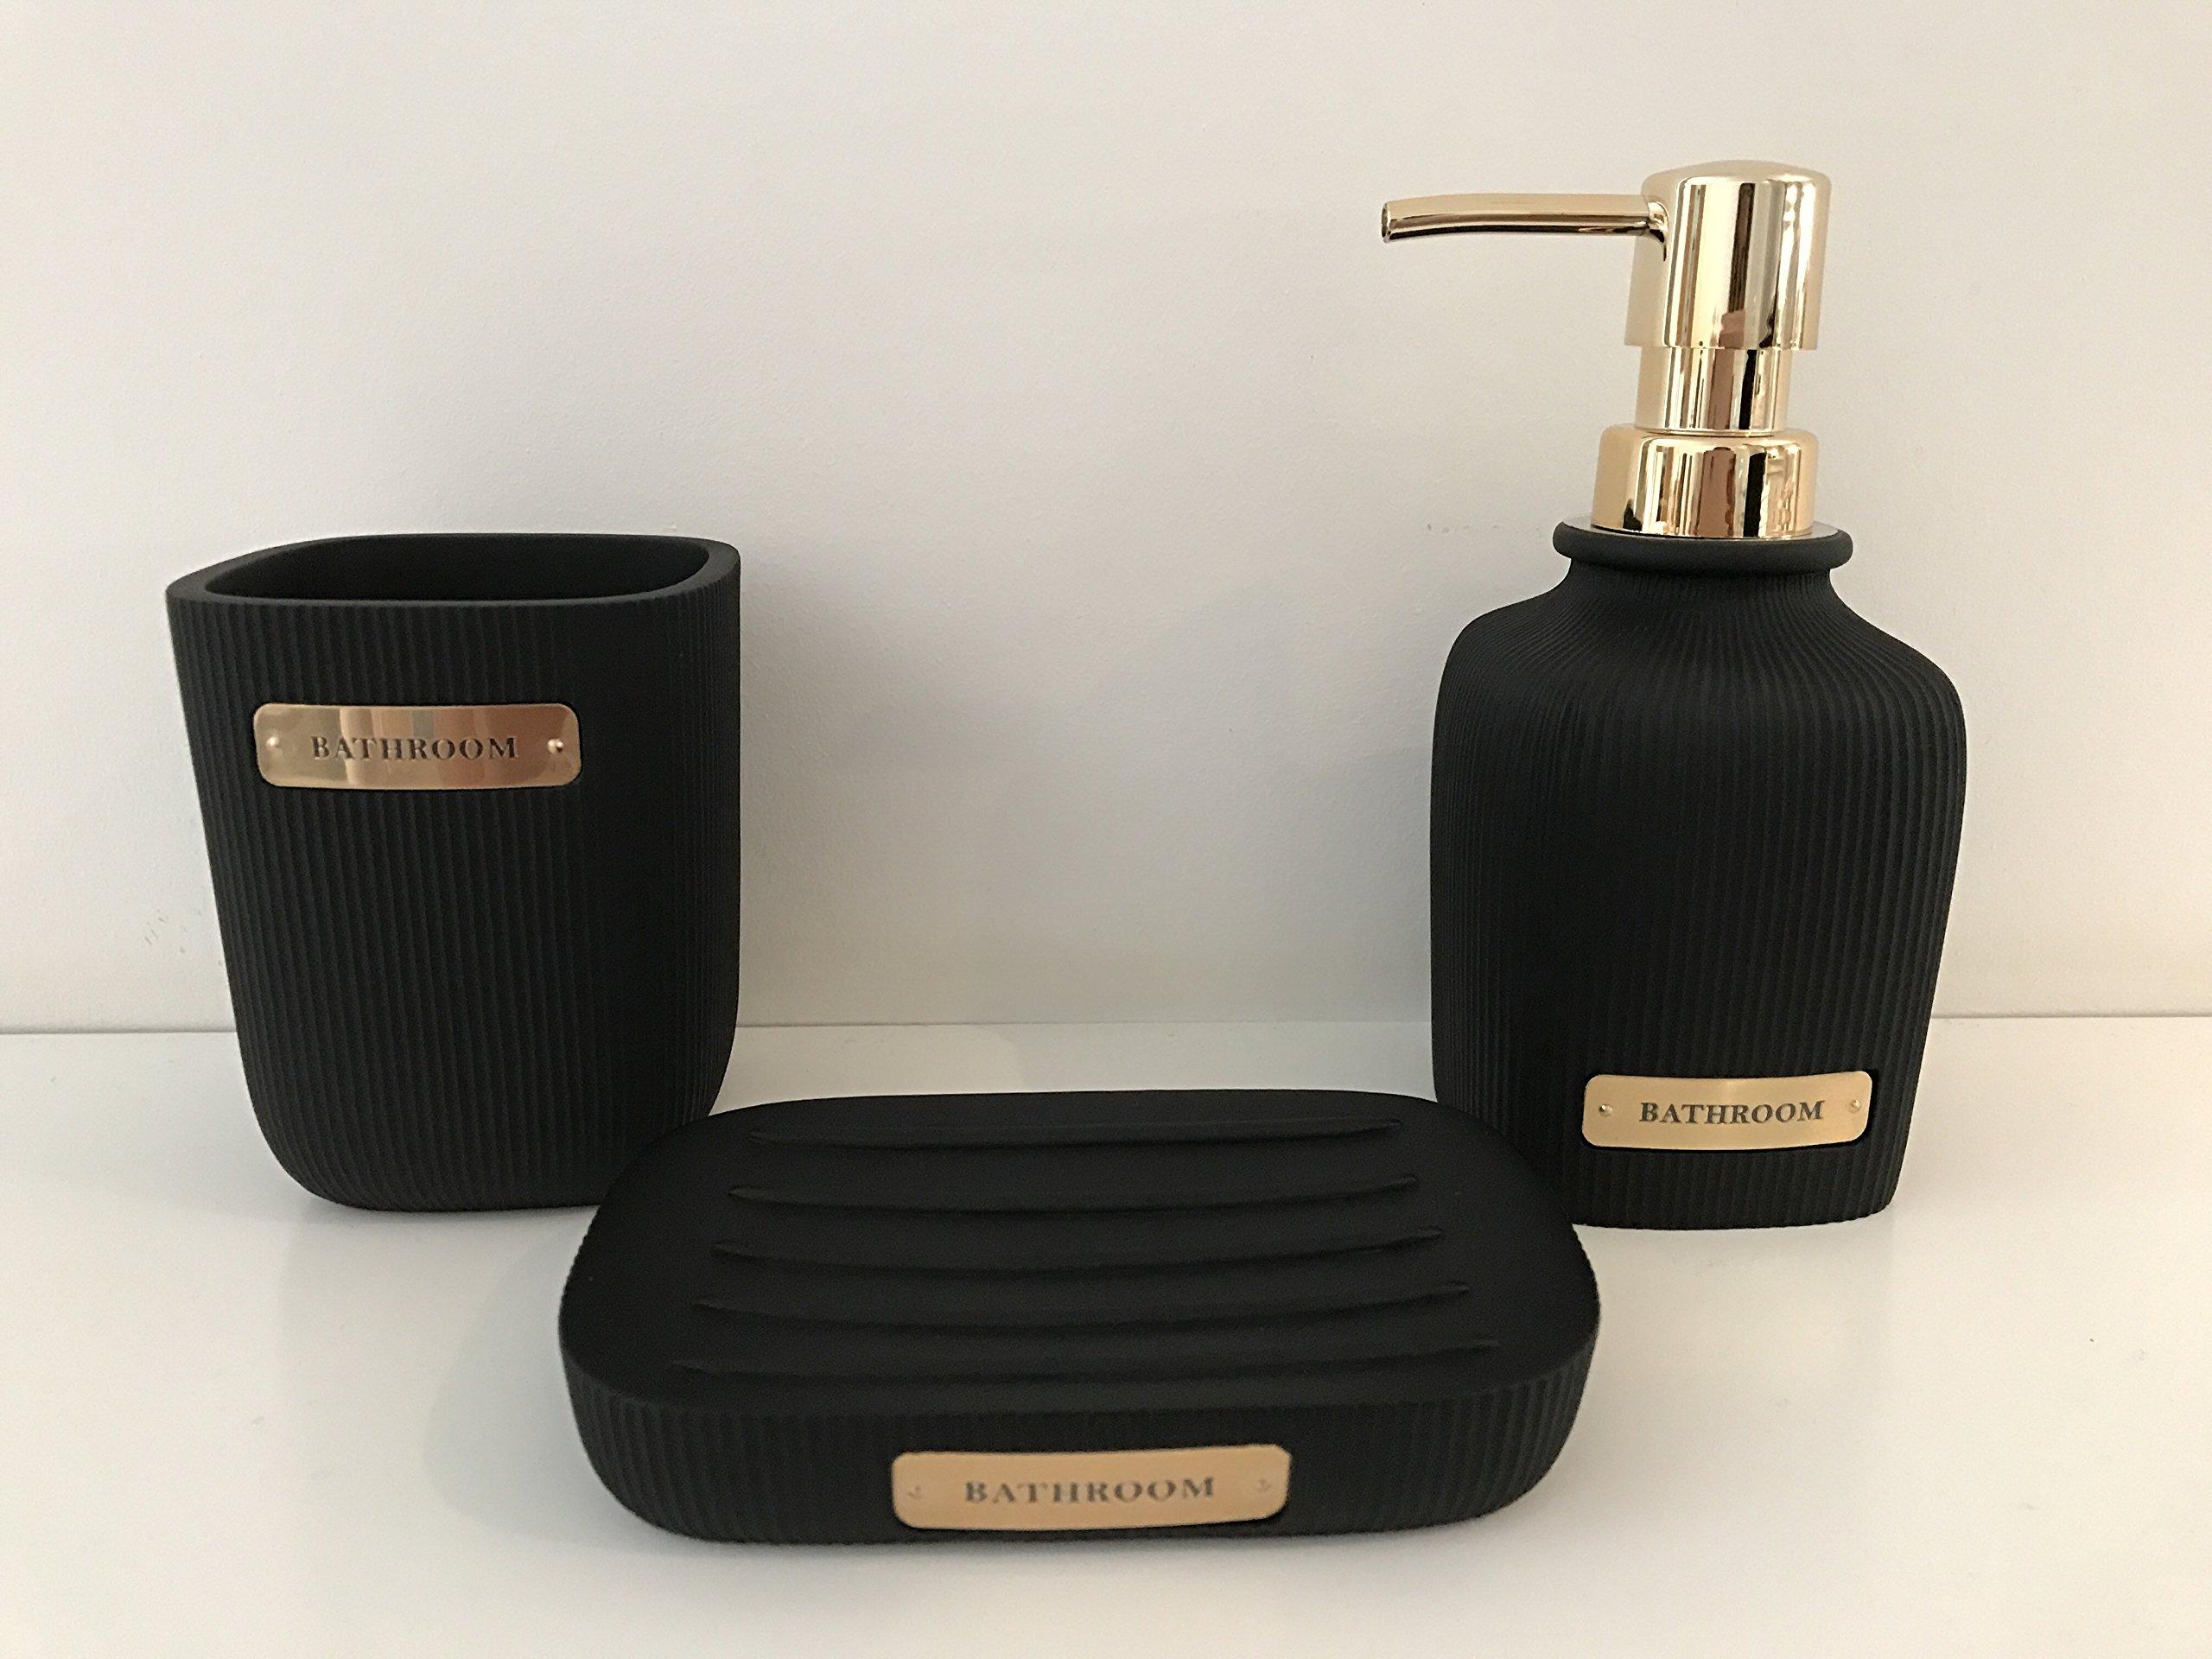 Set Of 5 Black & Gold Bathroom Set - Soap Dish - Toothbrush Holder - Soap  Dispenser